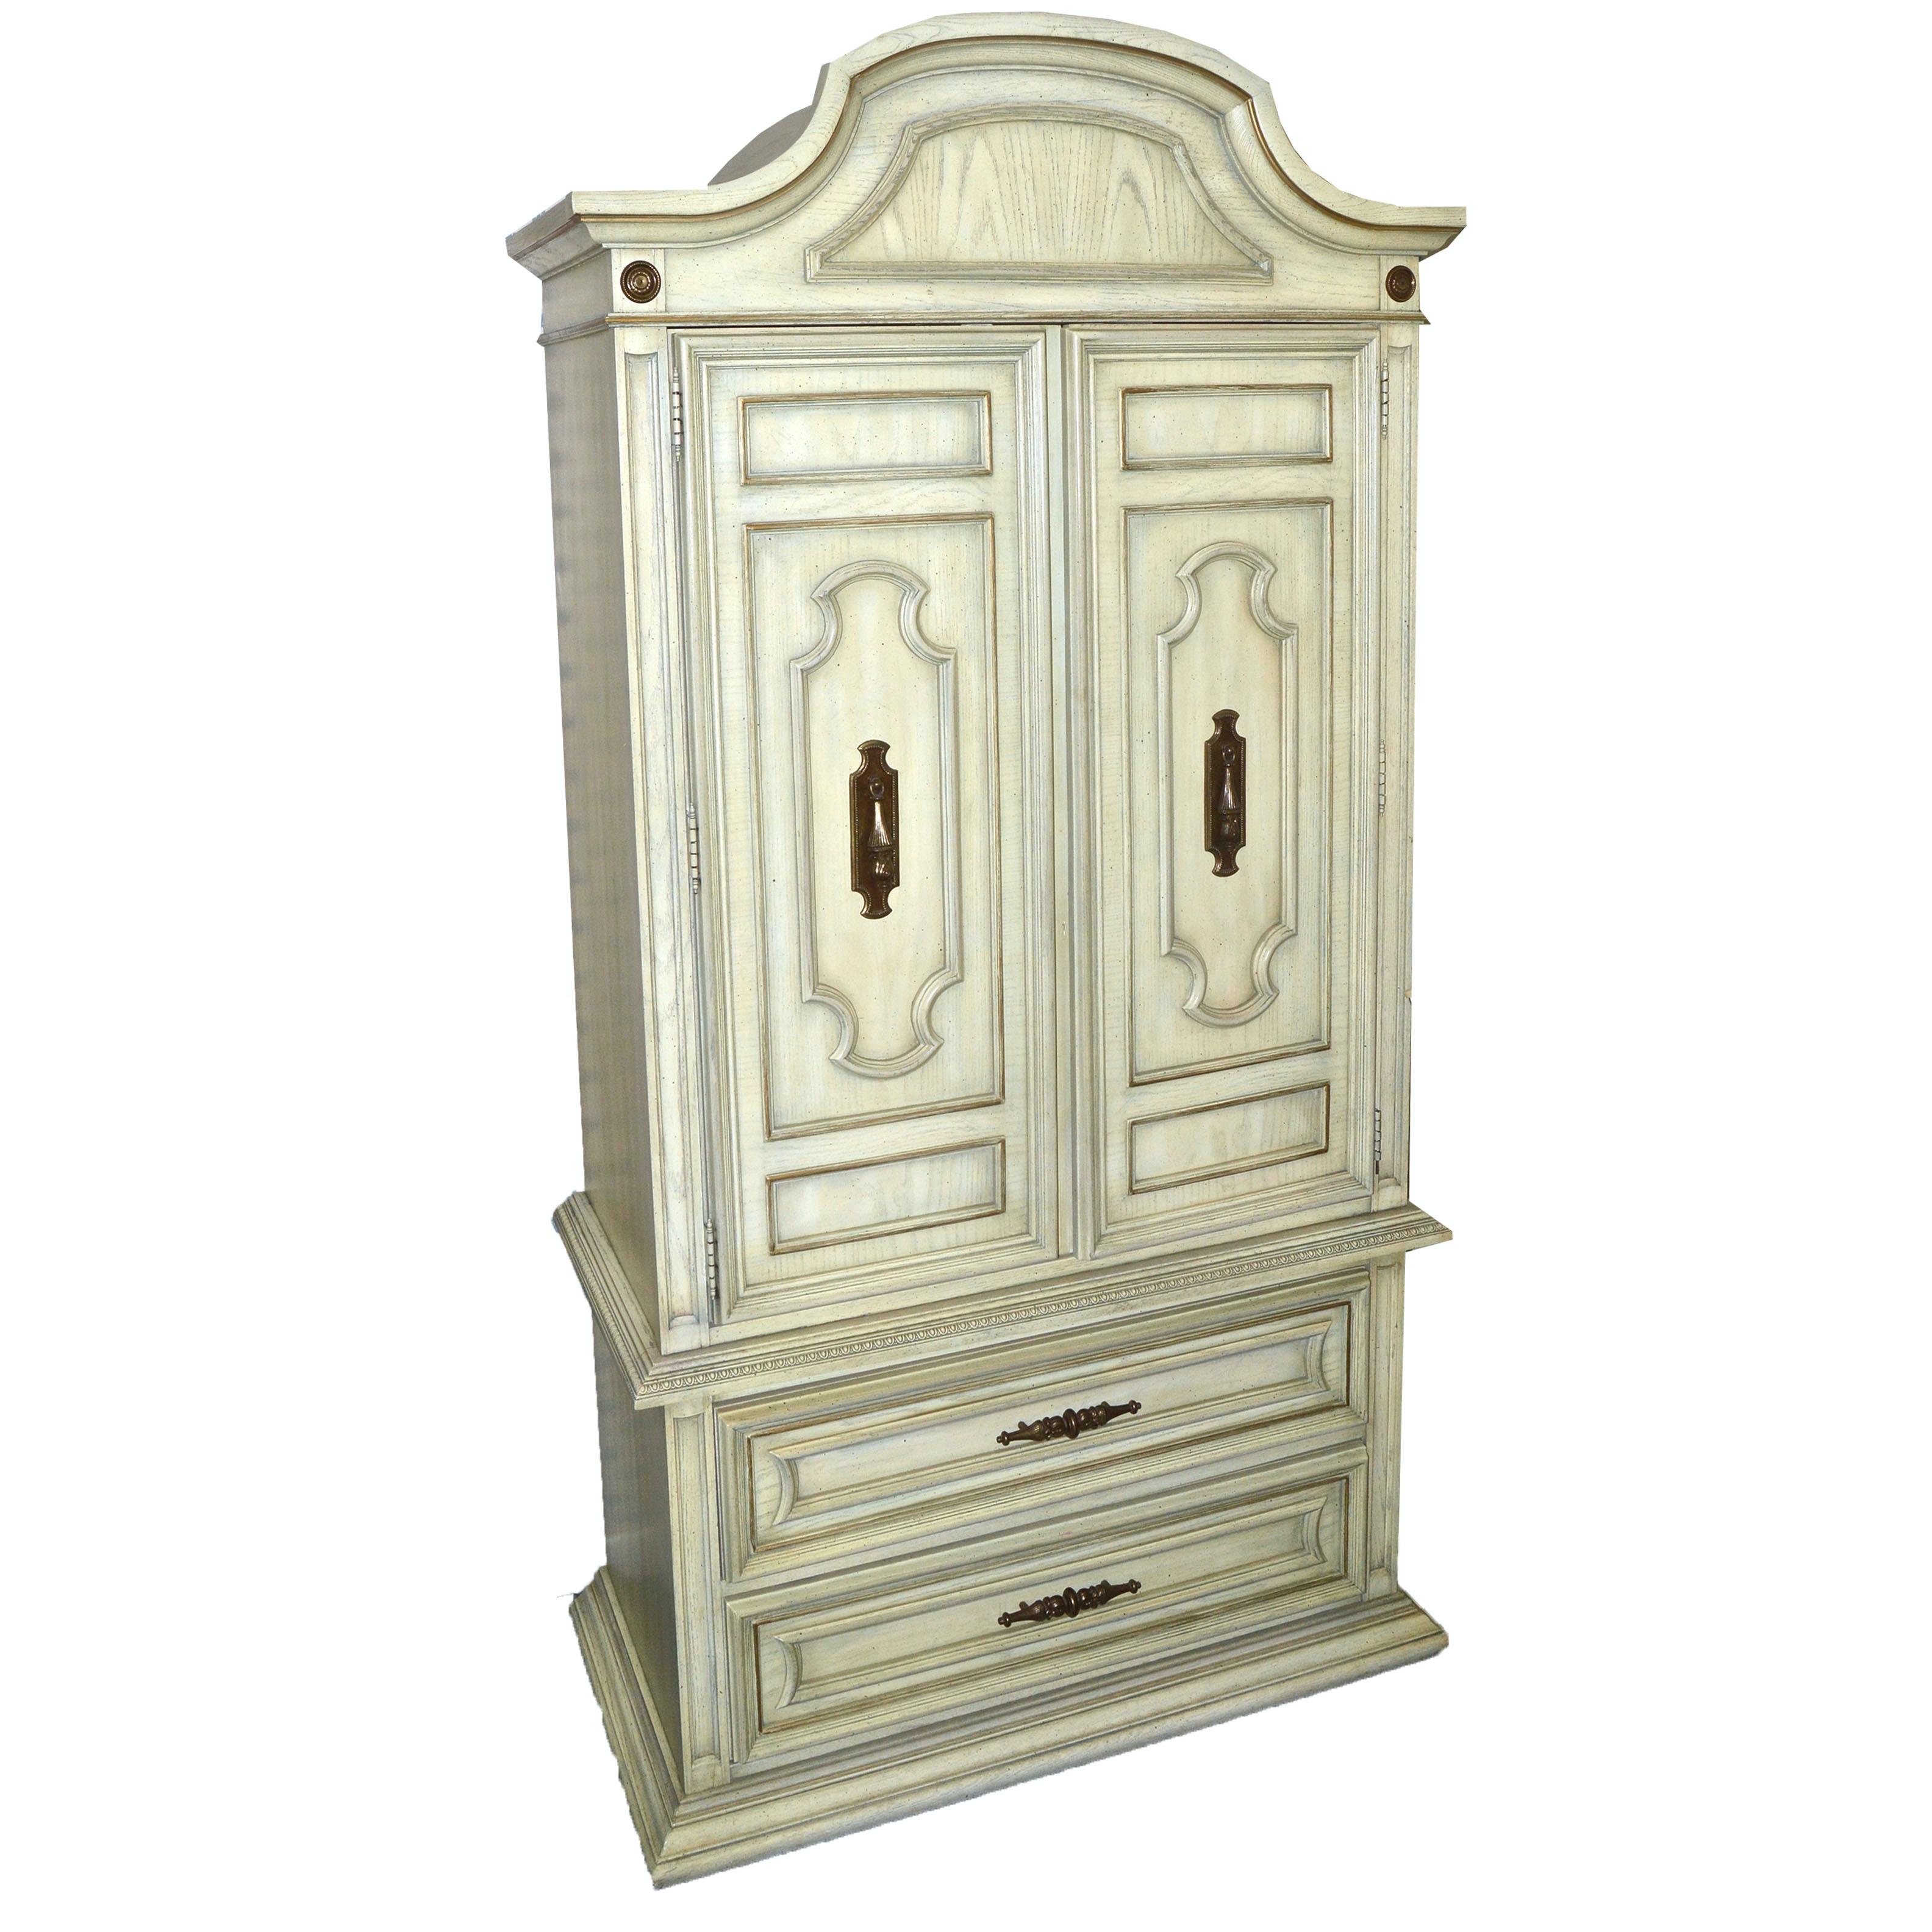 Louis XVI Style Wardrobe by Stanley Furniture